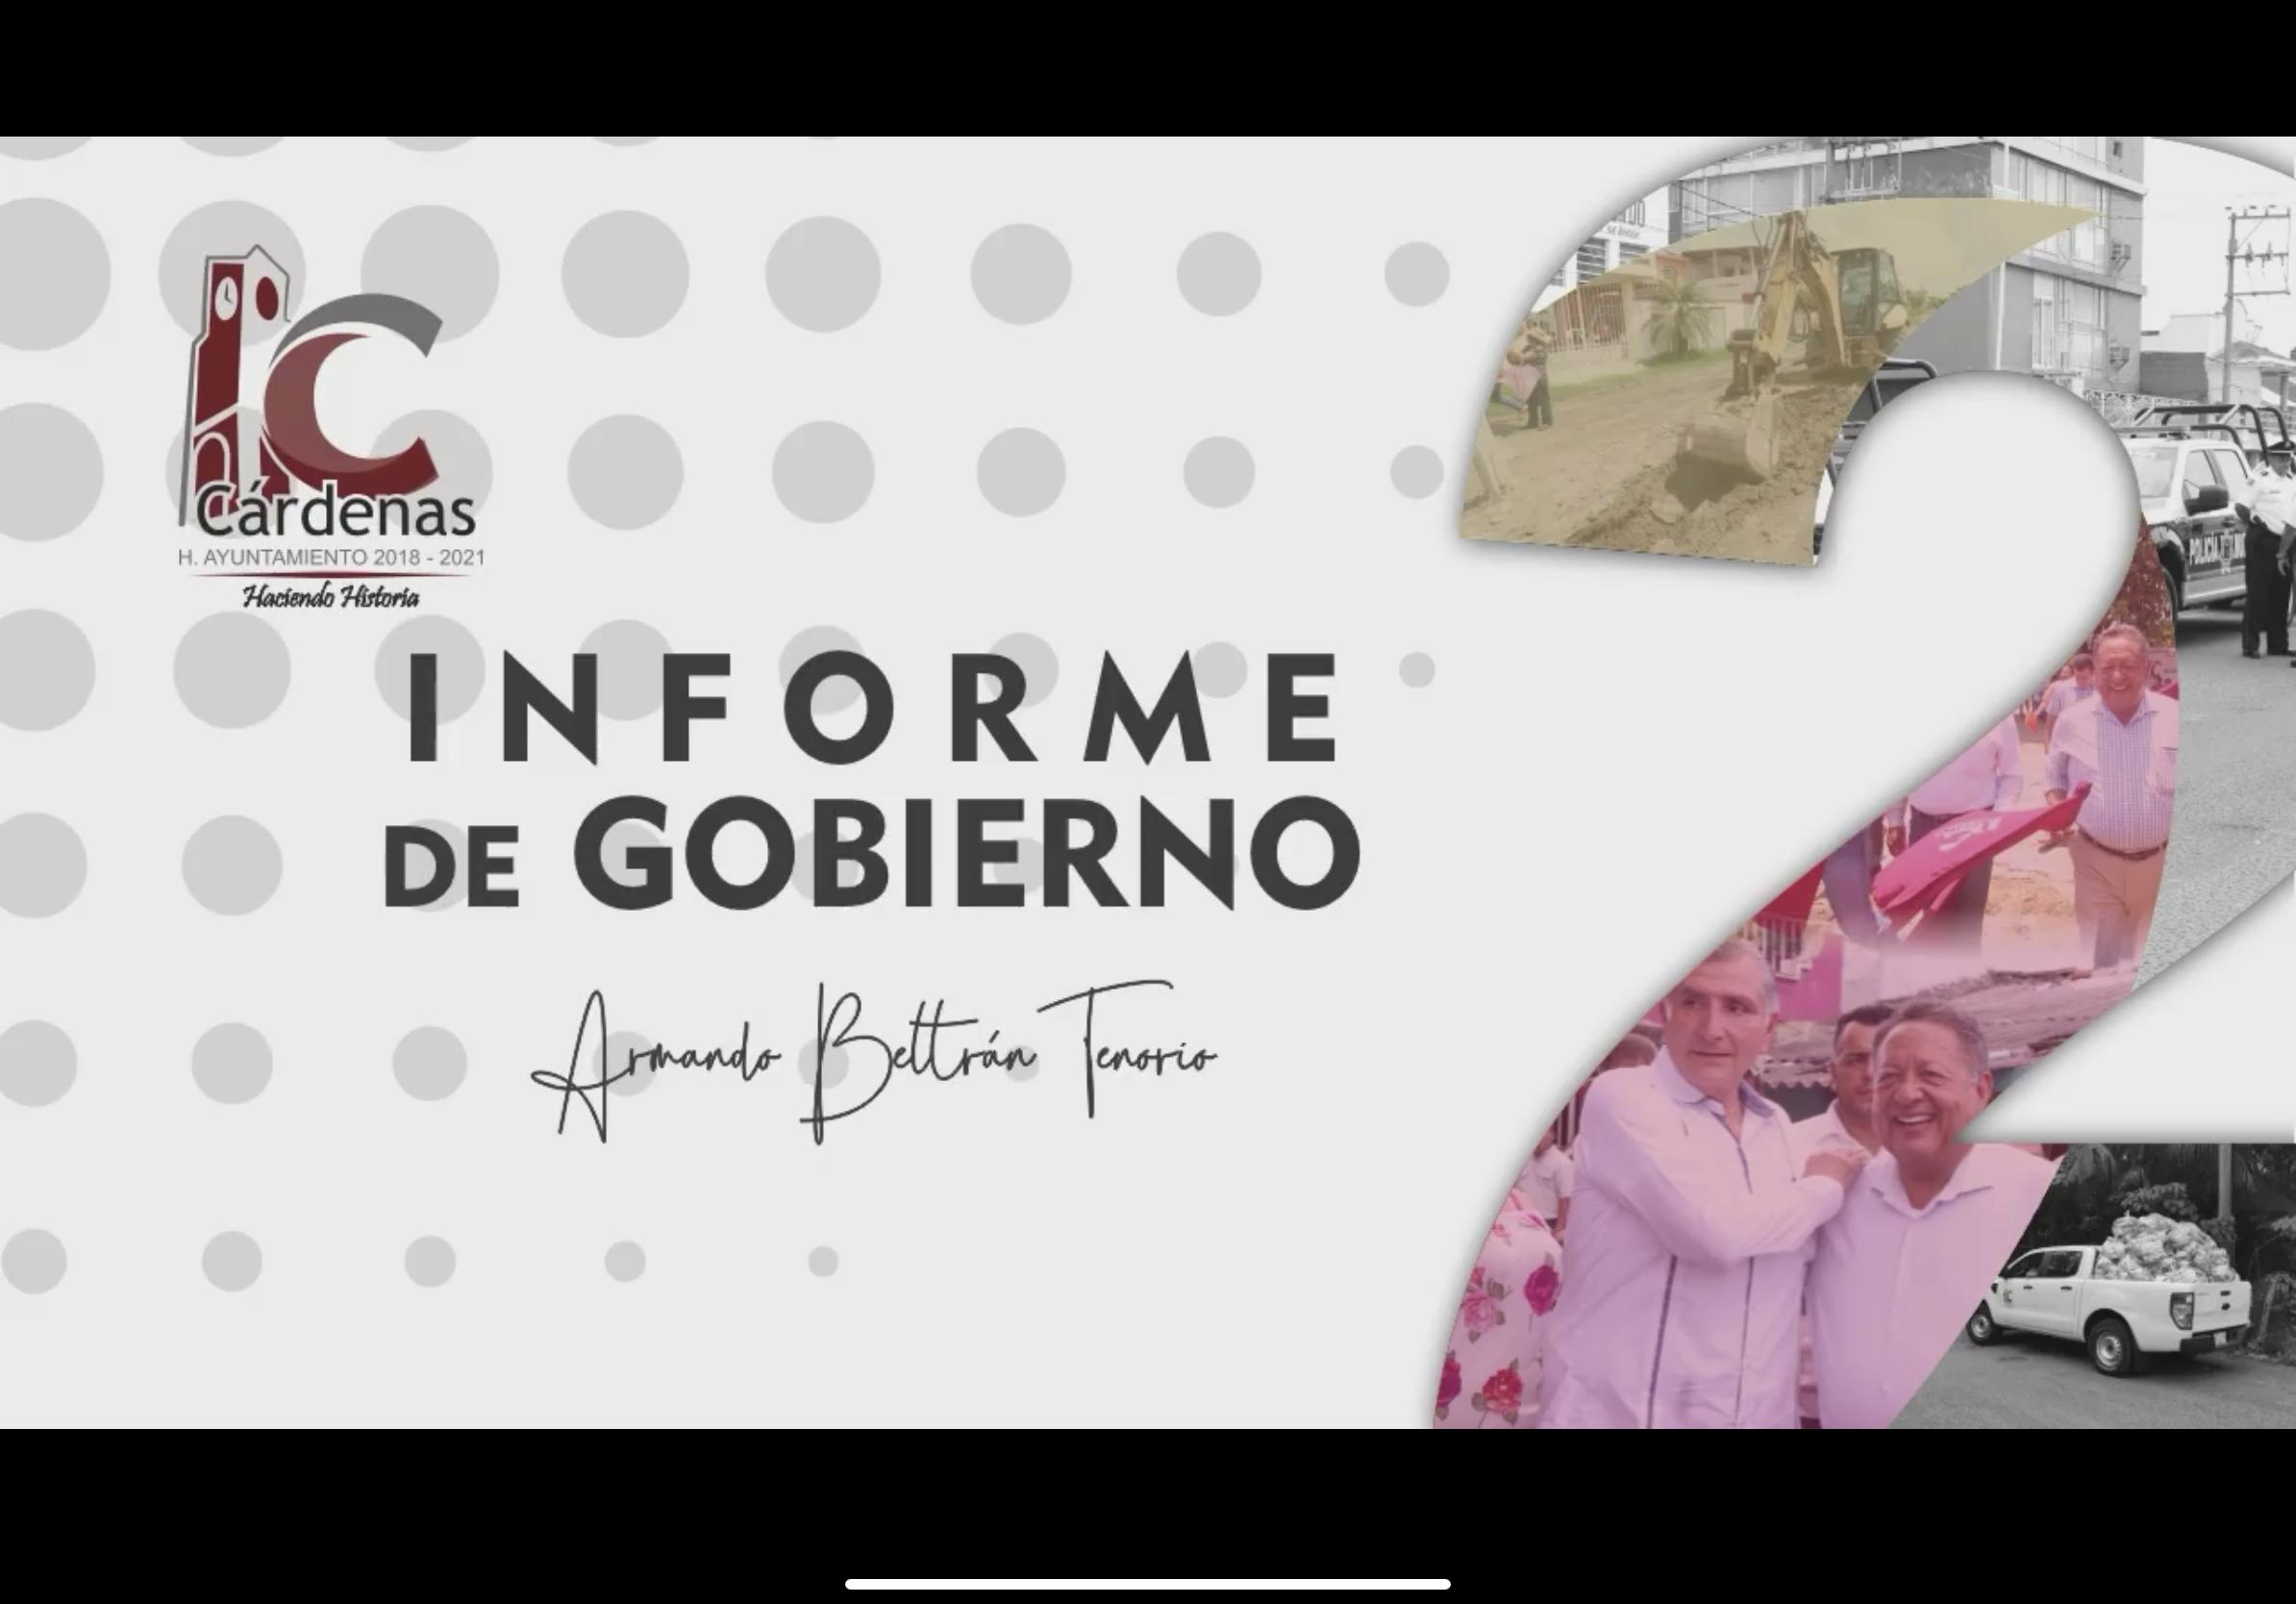 2DO Informe de Gobierno – Ayuntamiento de Cárdenas 2018-2021